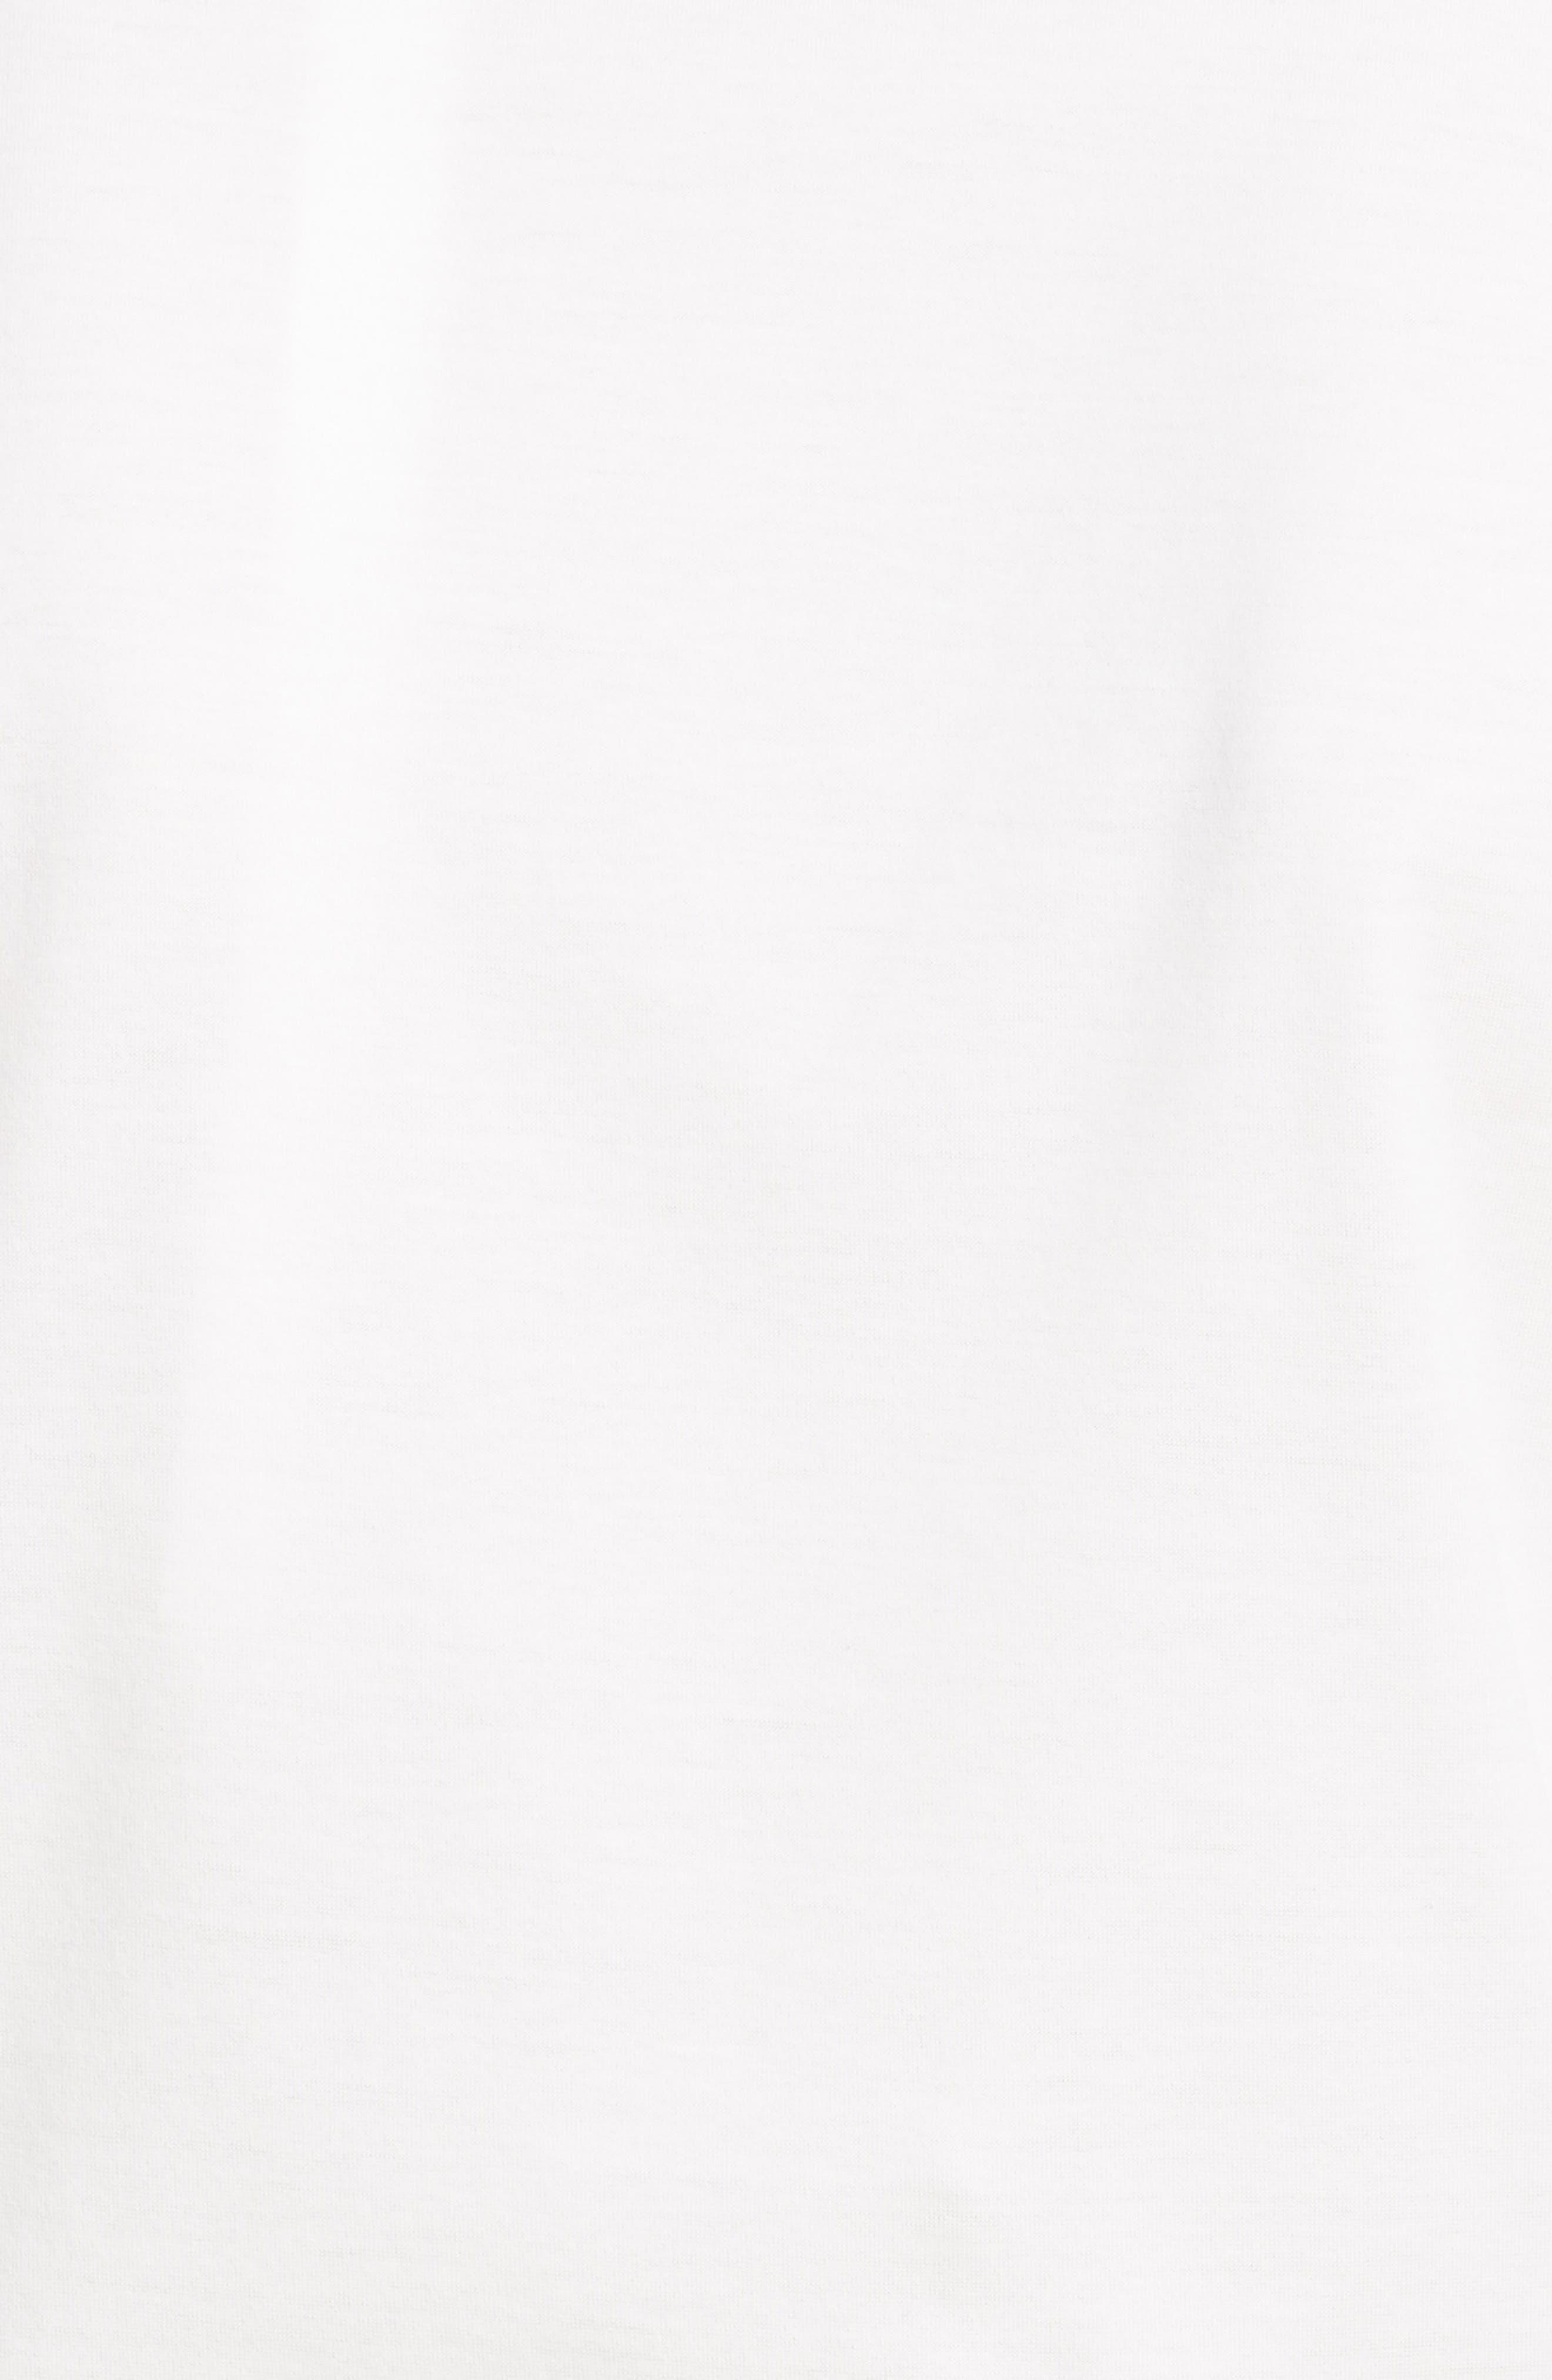 MONCLER GENIUS BY MONCLER, x 4 Simone Rocha Imitation Pearl Embellished Tee, Alternate thumbnail 5, color, WHITE